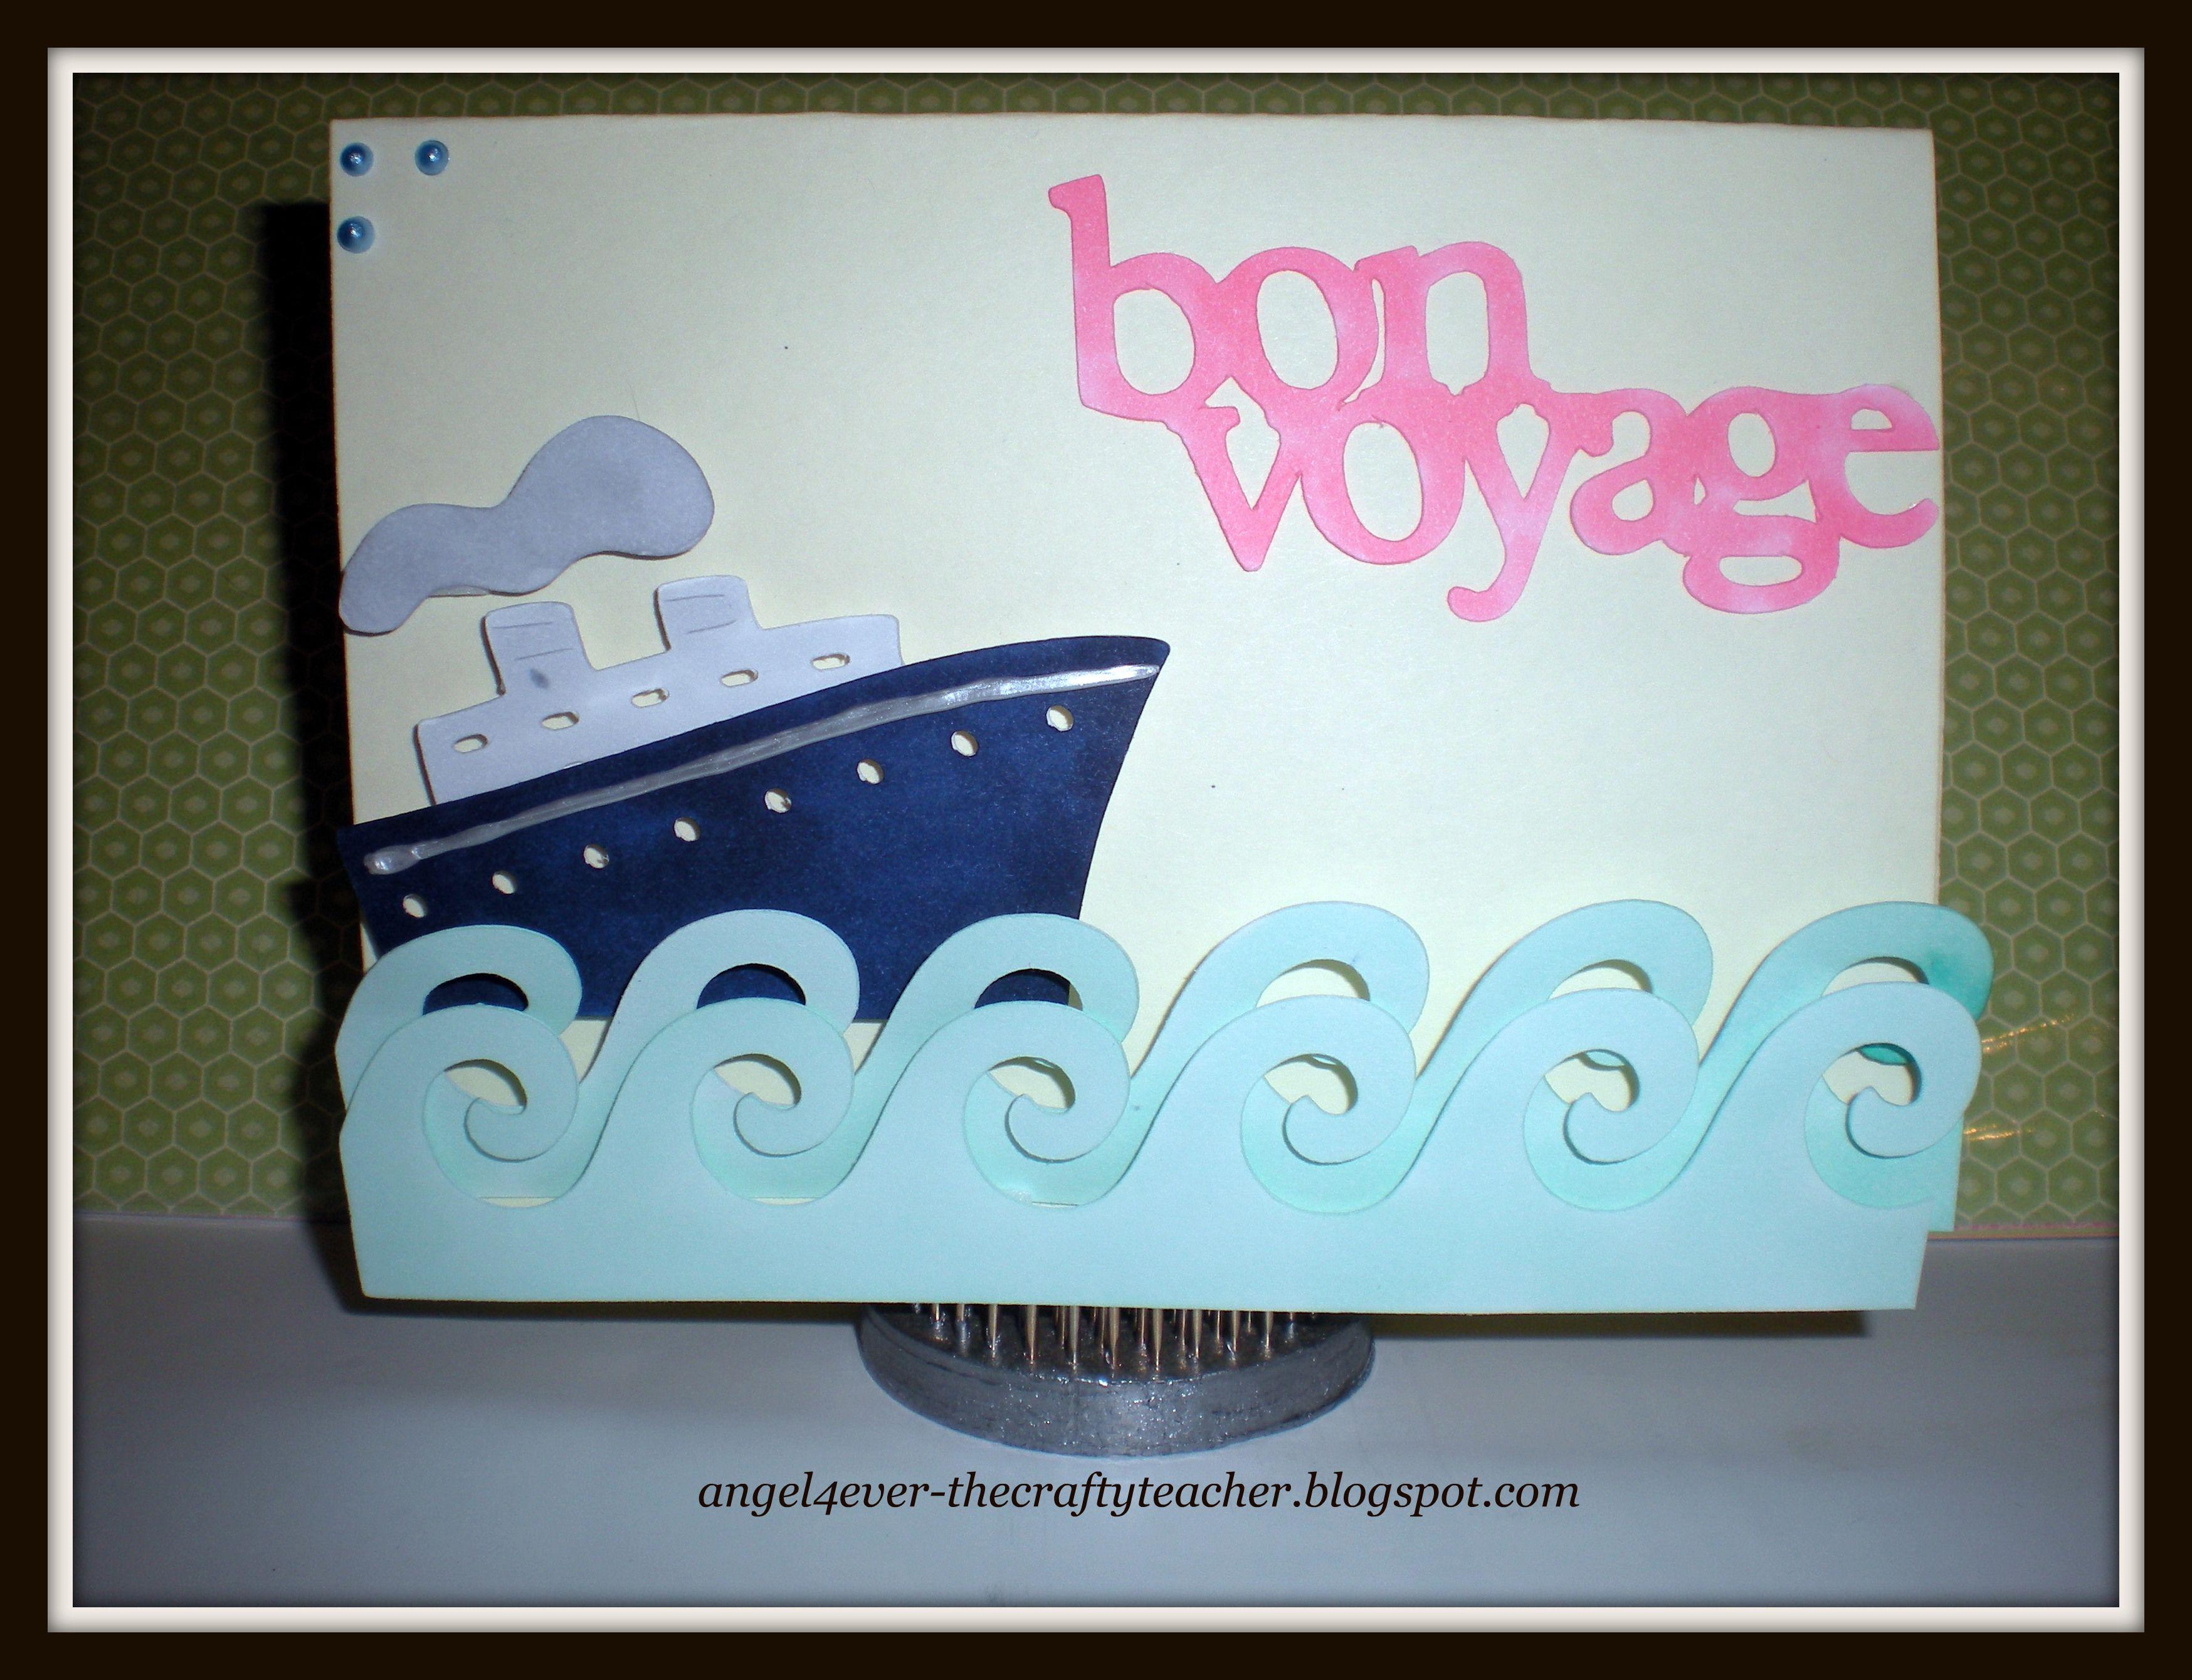 Bon voyage card i made using cricut cartridge life is a beach copic bon voyage card i made using cricut cartridge life is a beach copic markers kristyandbryce Image collections